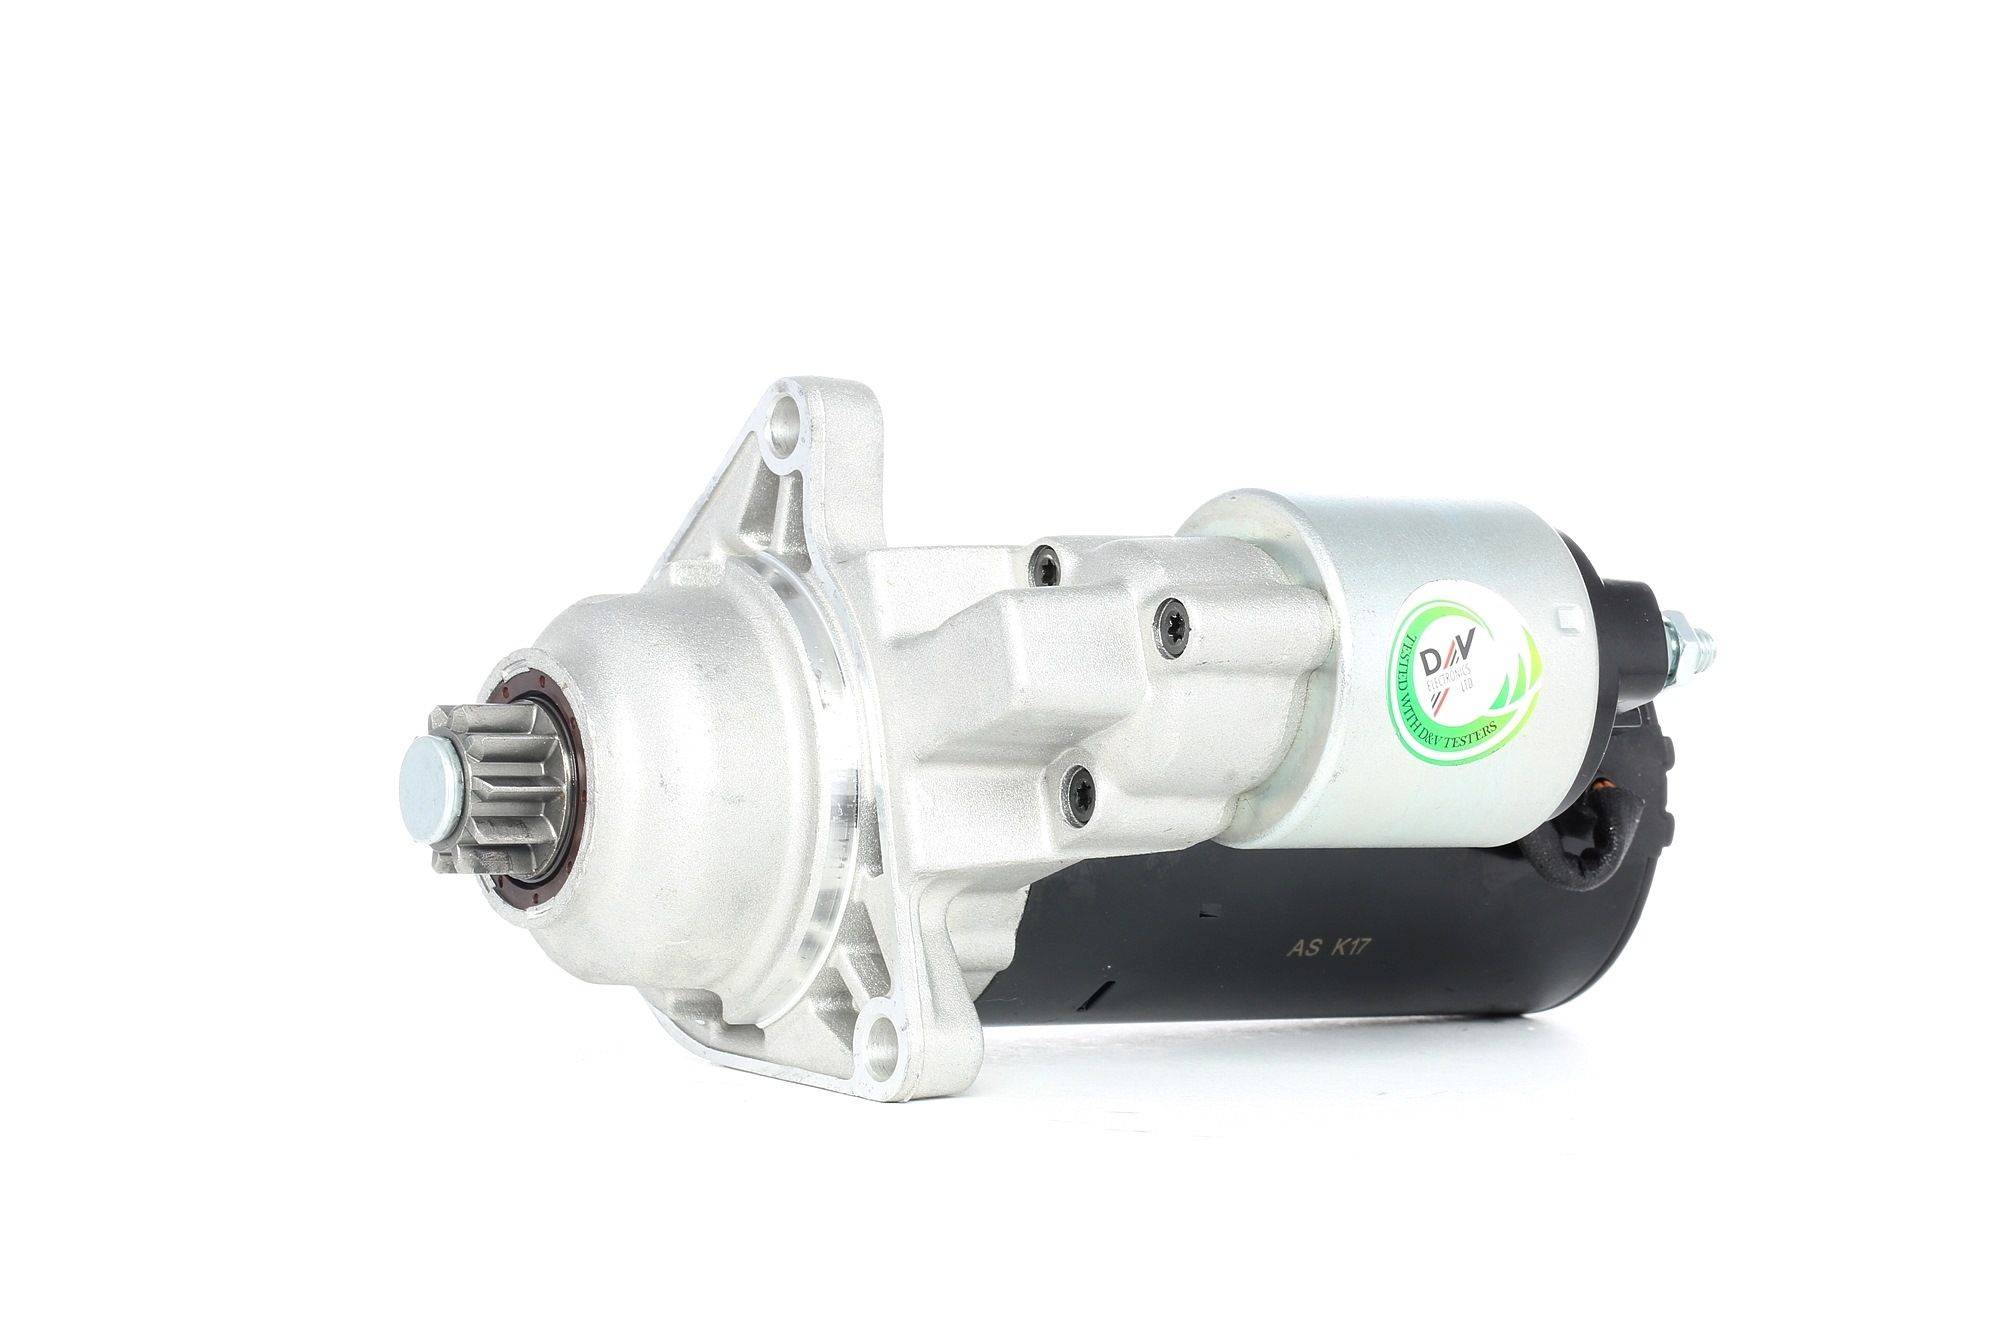 AS-PL Starttimoottori Brand new AS-PL Starter motor MT72AB S0005 Startti,Käynnistinmoottori VW,SEAT,TRANSPORTER IV Bus 70XB, 70XC, 7DB, 7DW